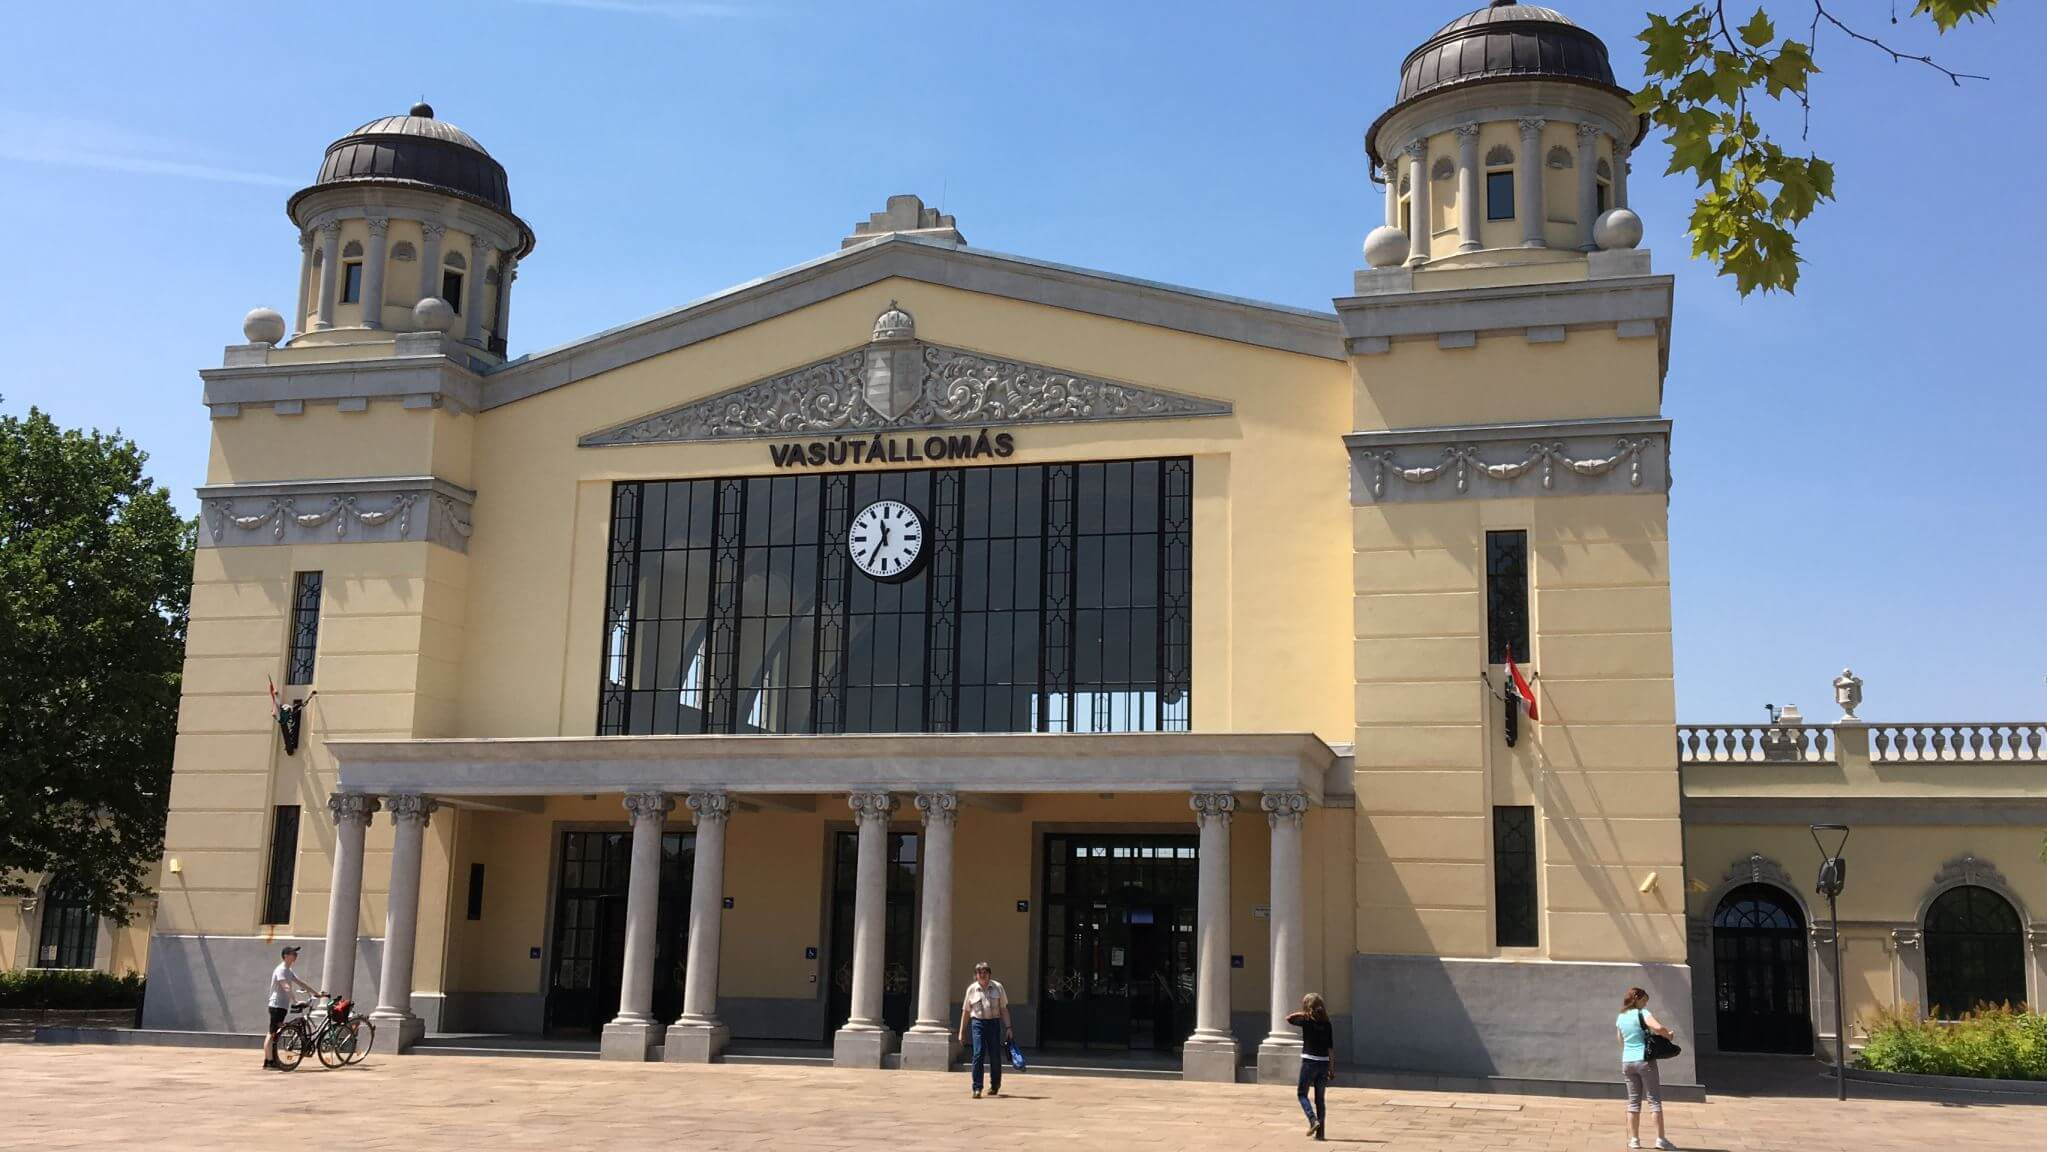 Train Terminal in Bekescsaba, Hungary